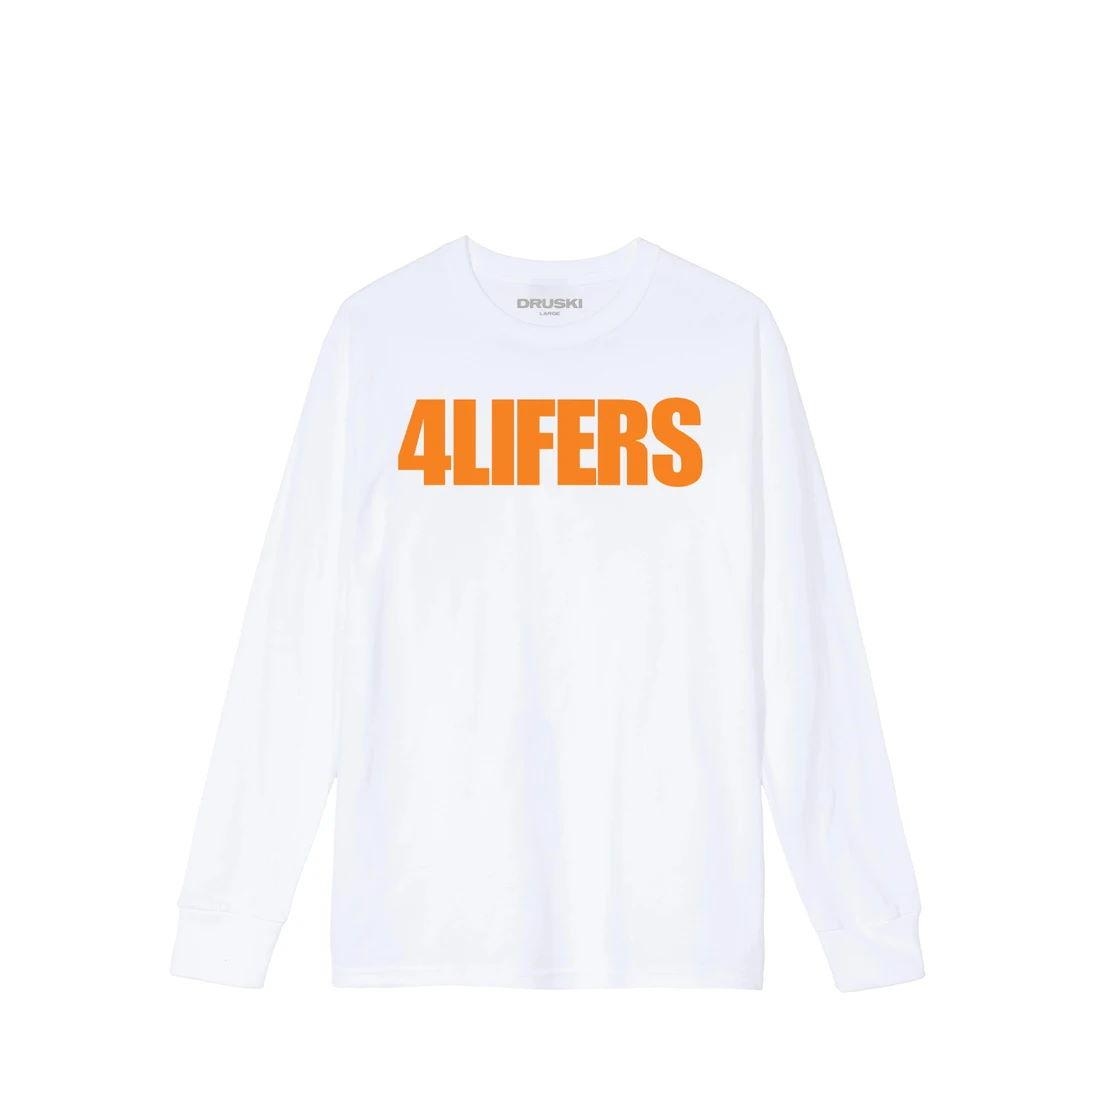 4Lifers Long Sleeve Tee - White